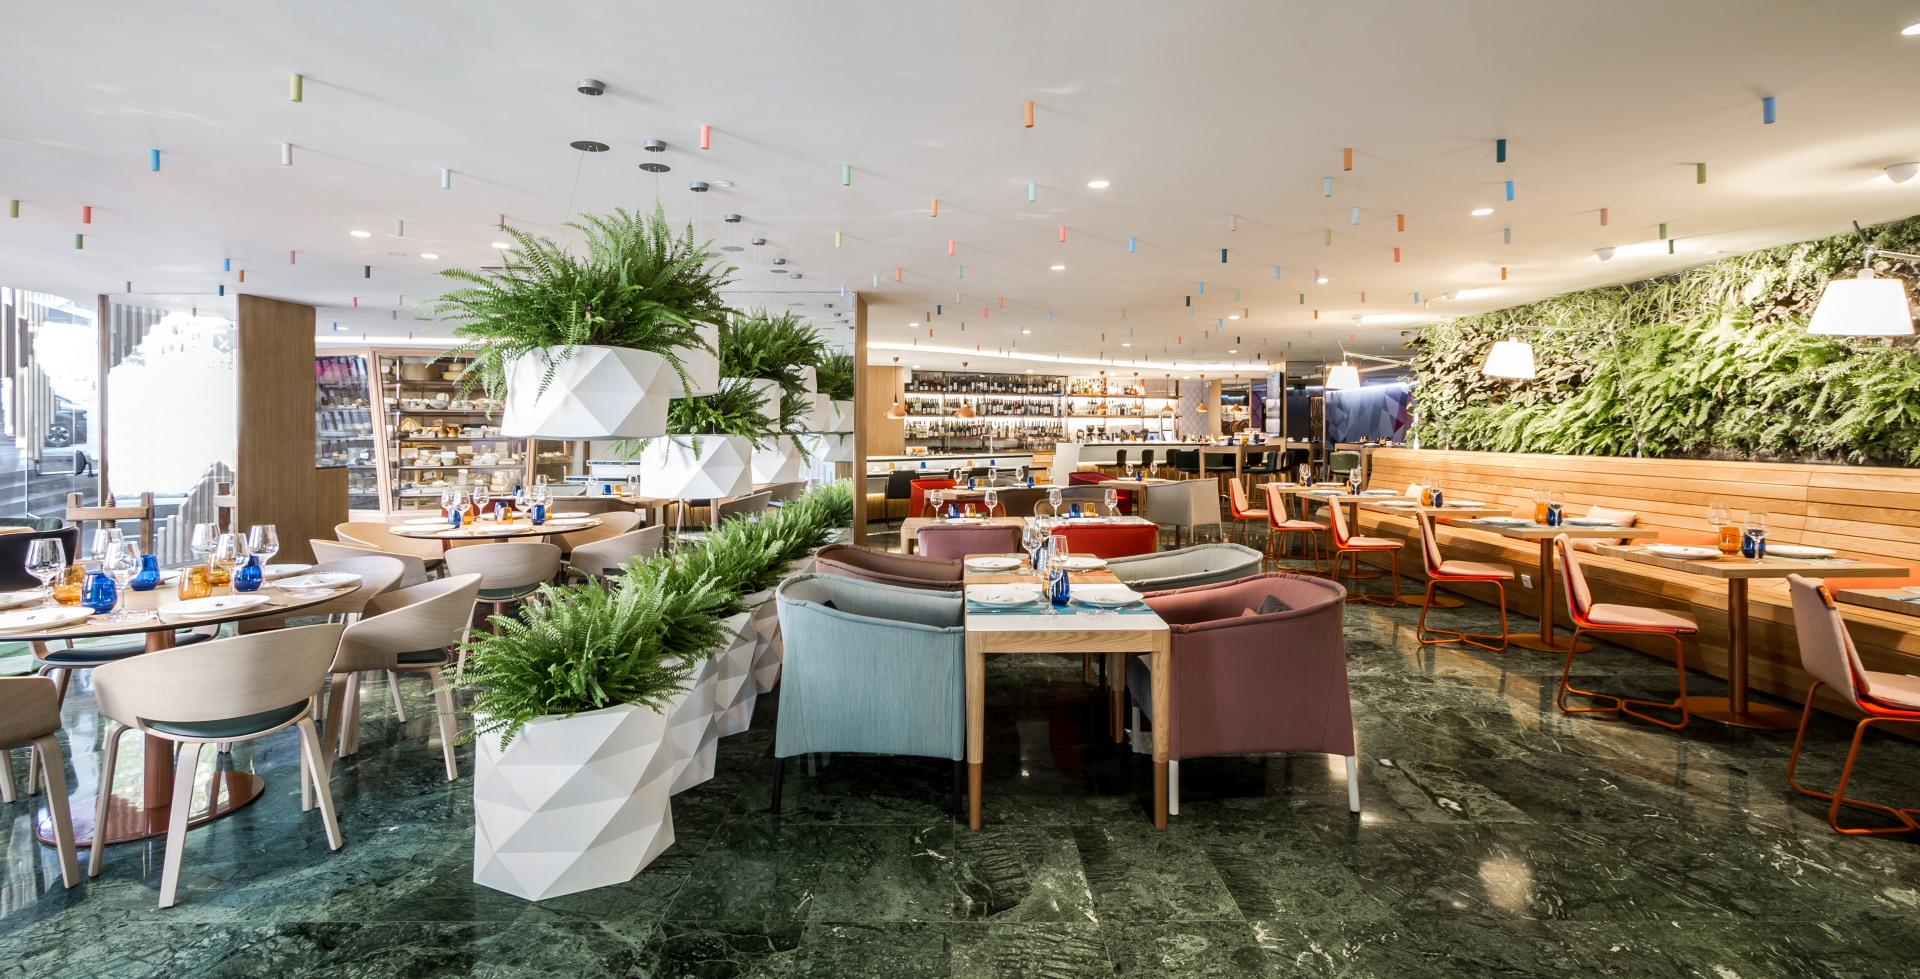 fotografia-arquitectura-valencia-german-cabo-estudihac-poncelet-cheese-bar-barcelona (8)